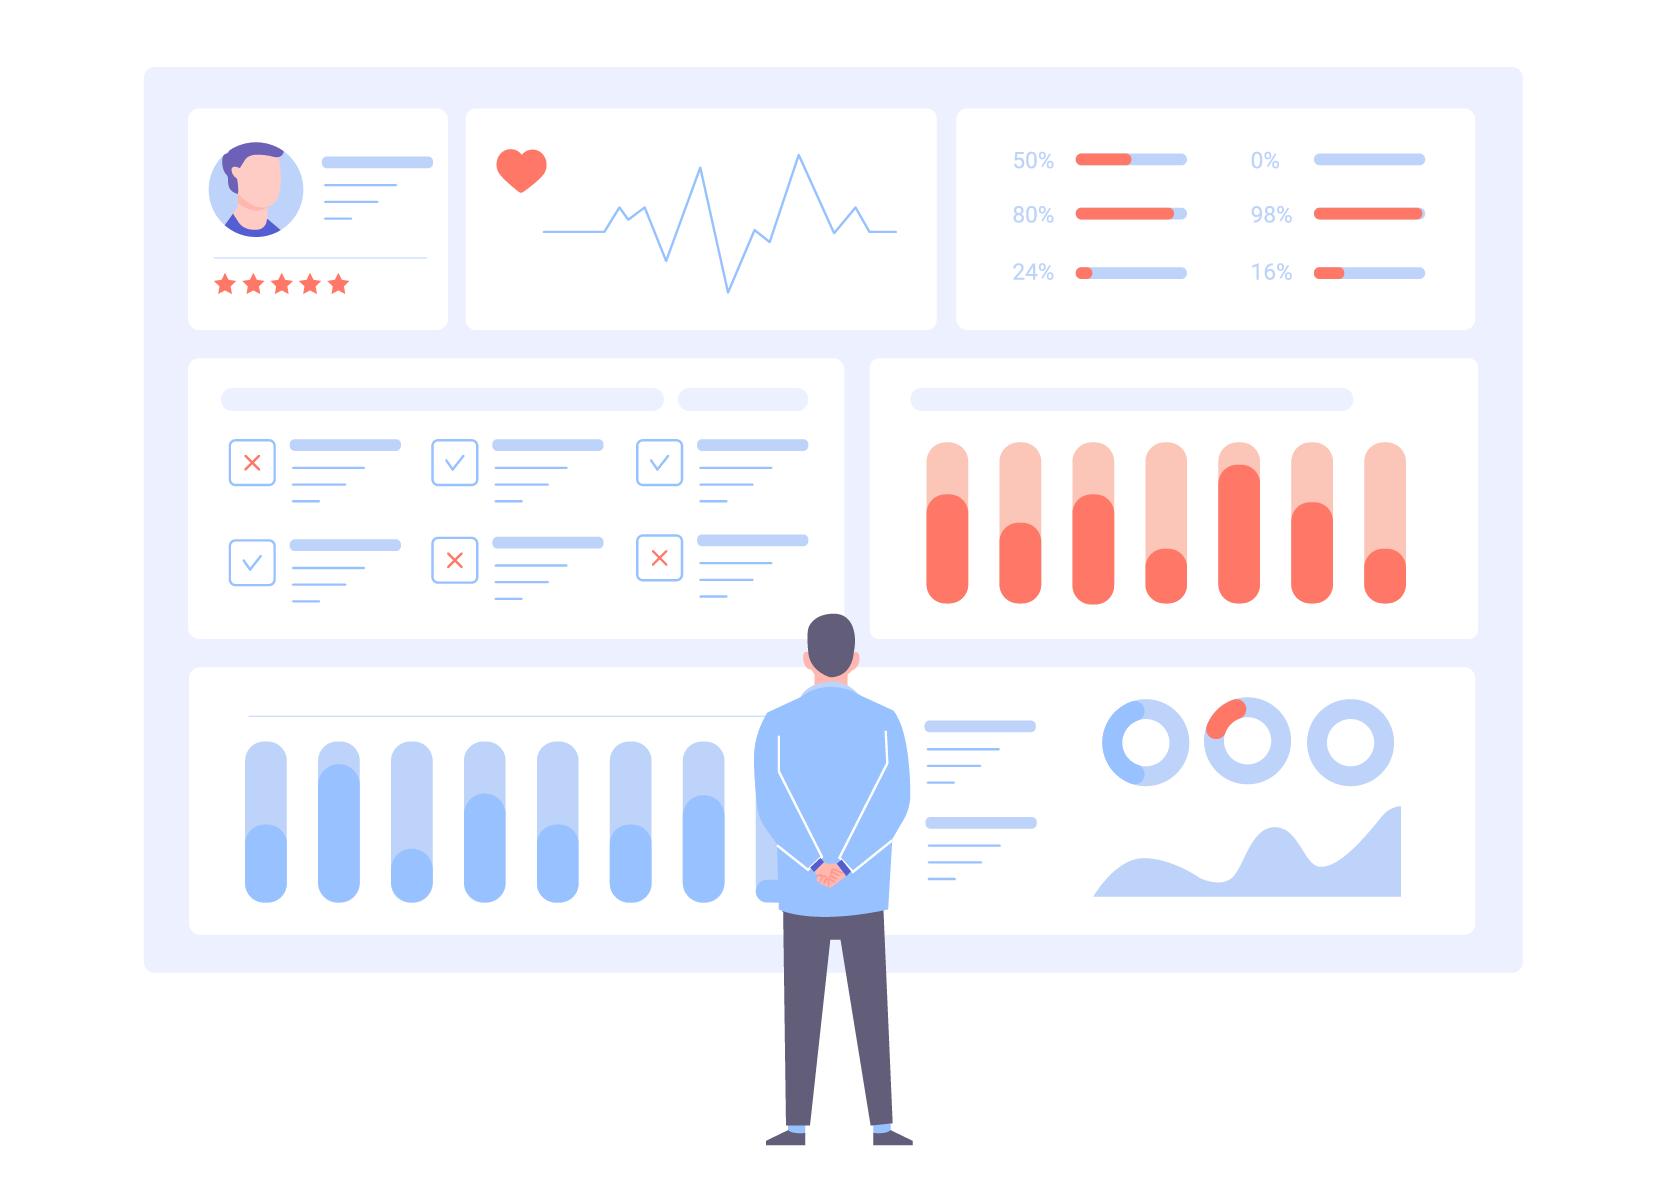 CEO Insights: Board Relationship Dashboard